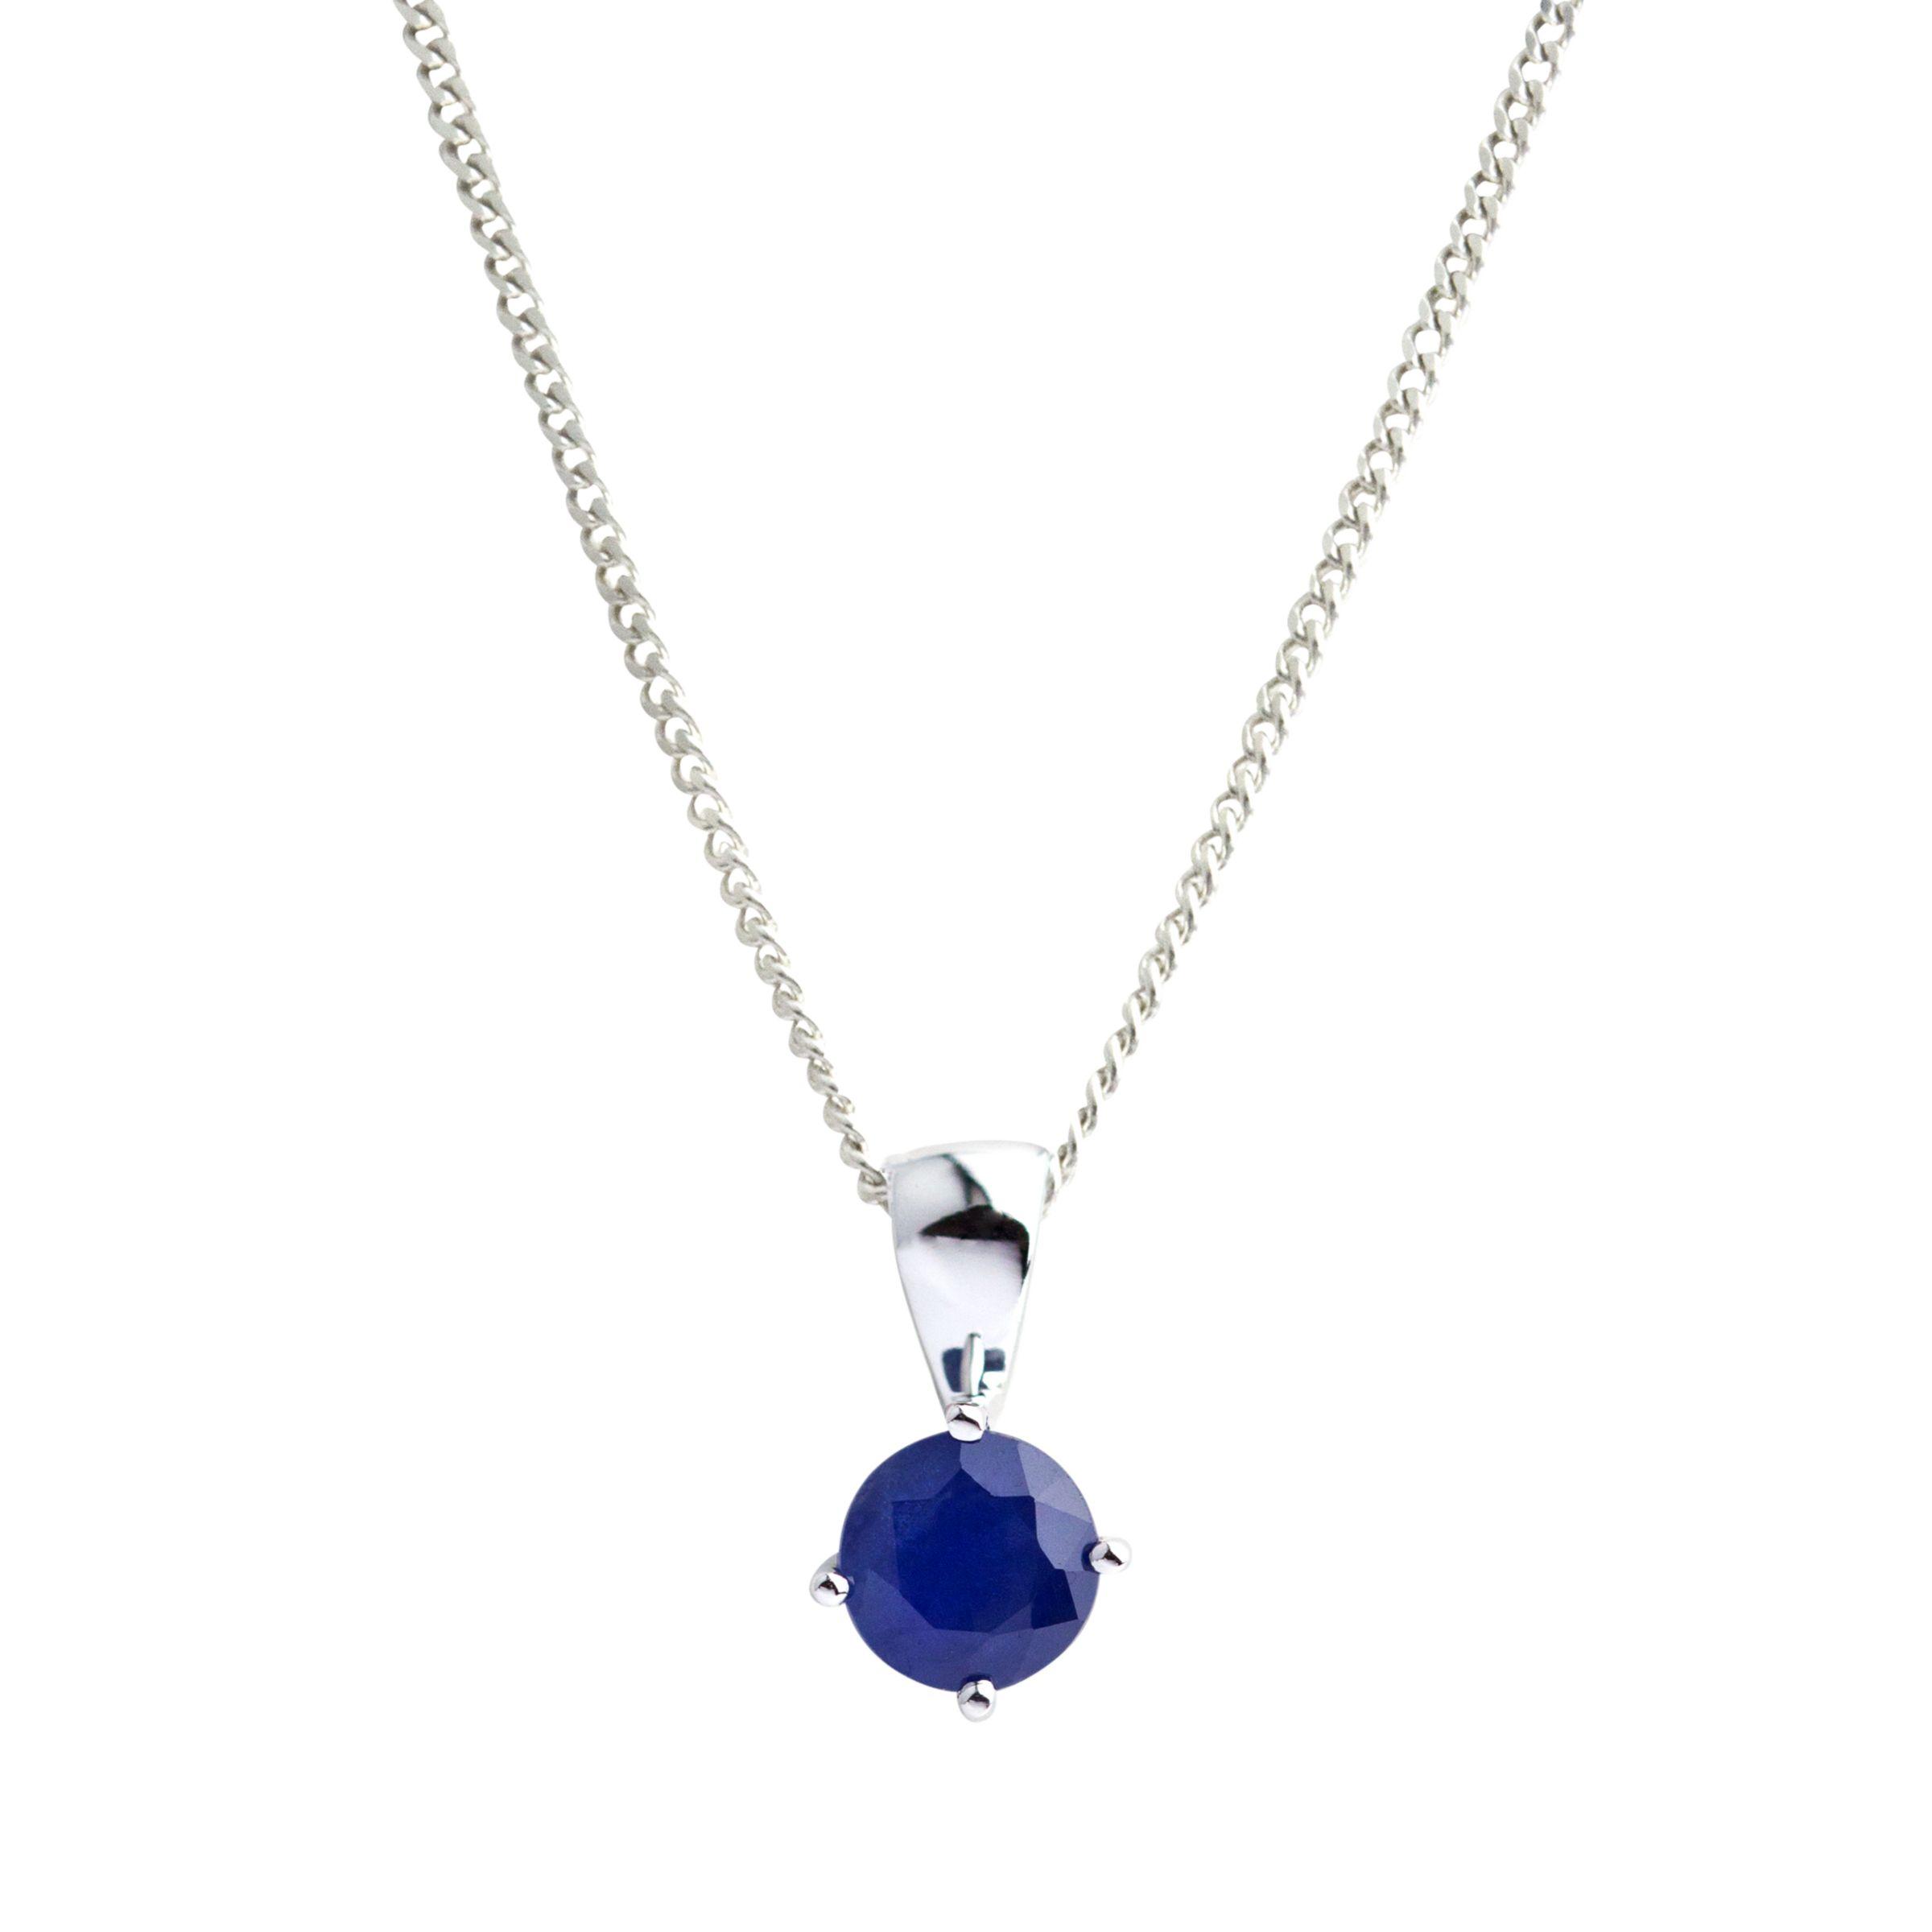 A B Davis A B Davis 9ct White Gold Round Sapphire Pendant Necklace